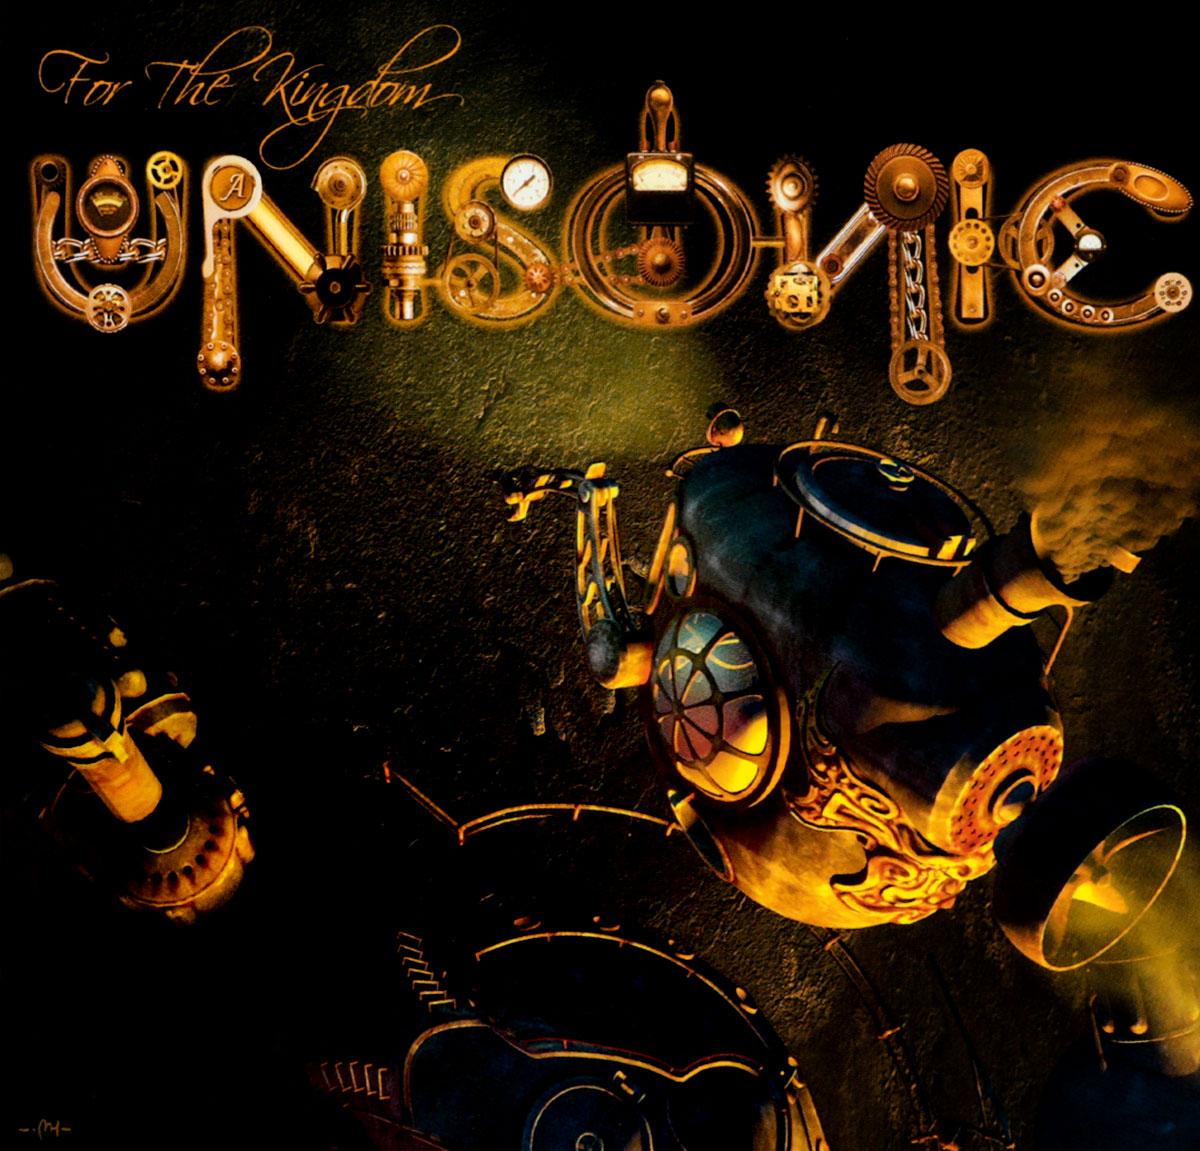 Unisonic Unisonic. For The Kingdom unisonic unisonic unisonic